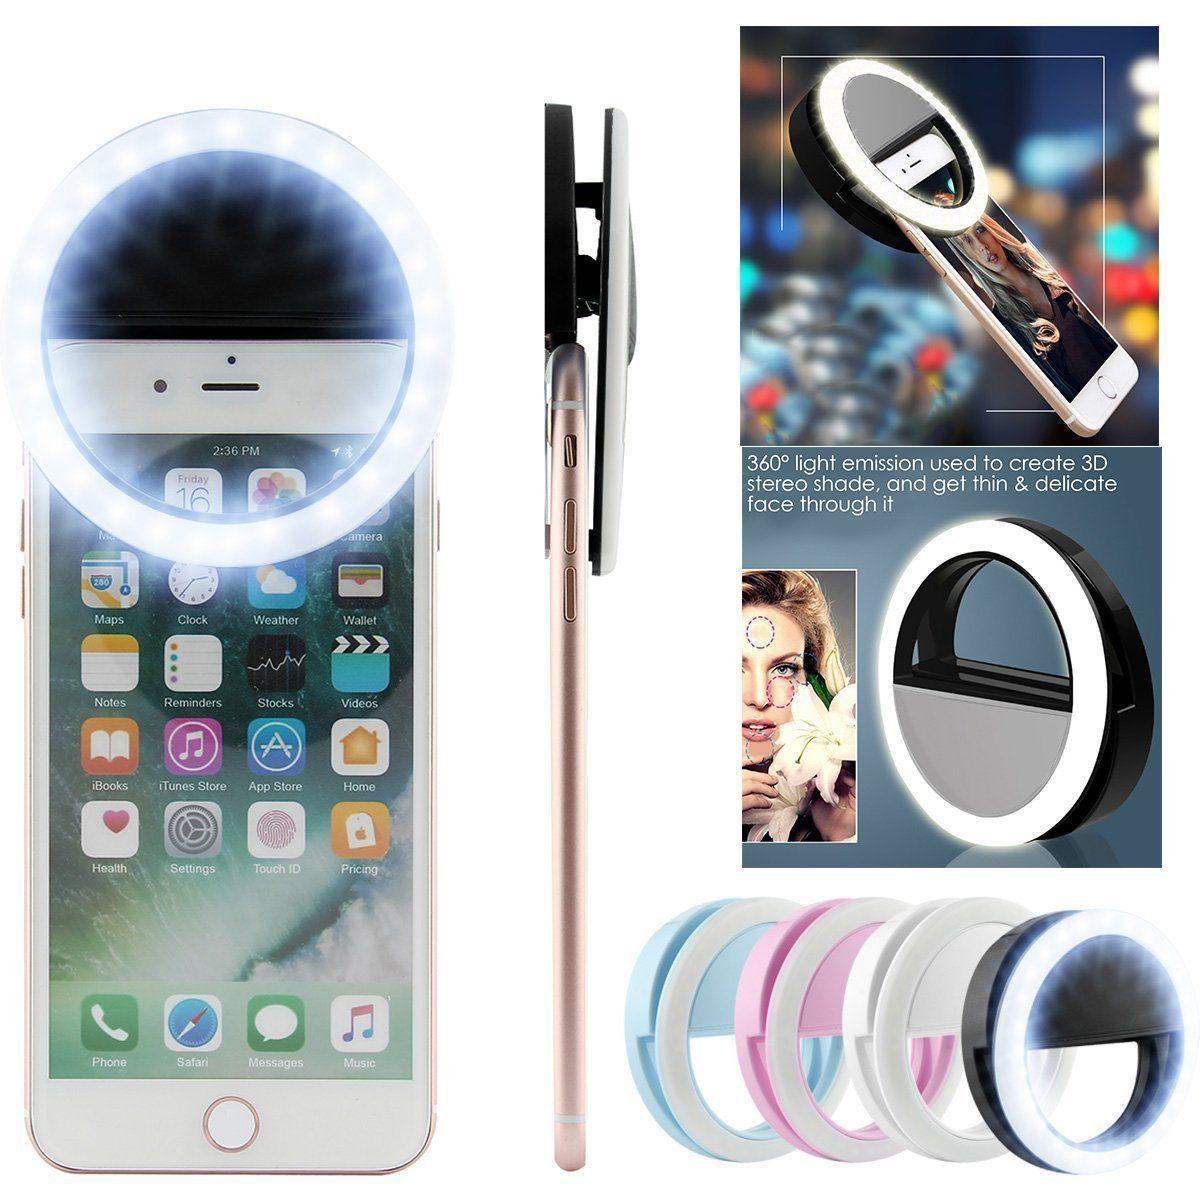 Led Lighting For Camera Phones Tablet Full Hd Do 500 Zl Smonet Wireless Hd Camera Cctv Security Kit Hd Tv Shows Stream: Selfie LED Light Ring Flash Fill Clip Camera For Phone